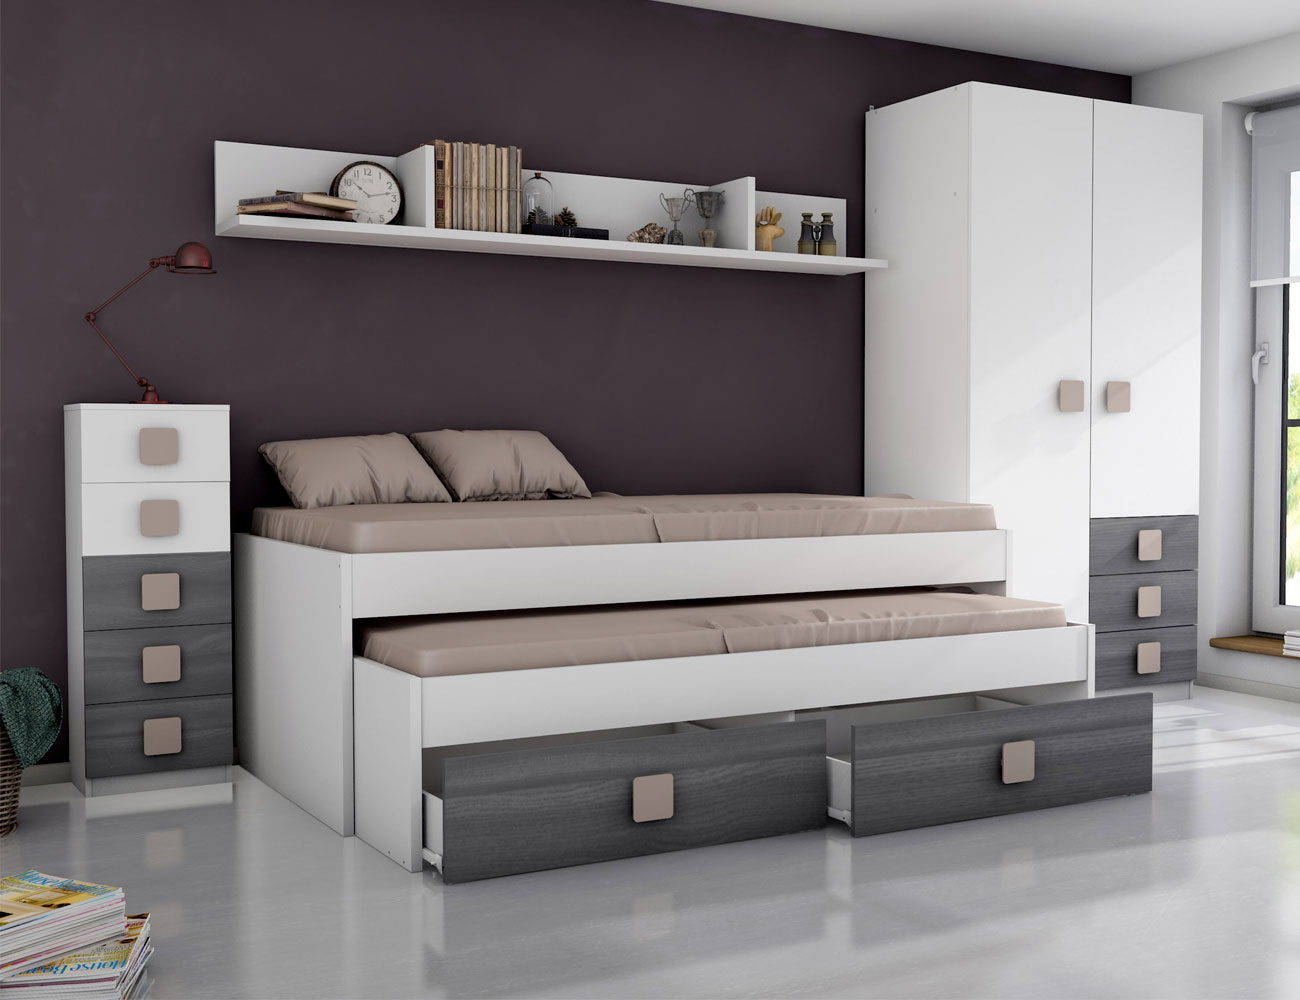 Dormitorio juvenil ceniza moka2